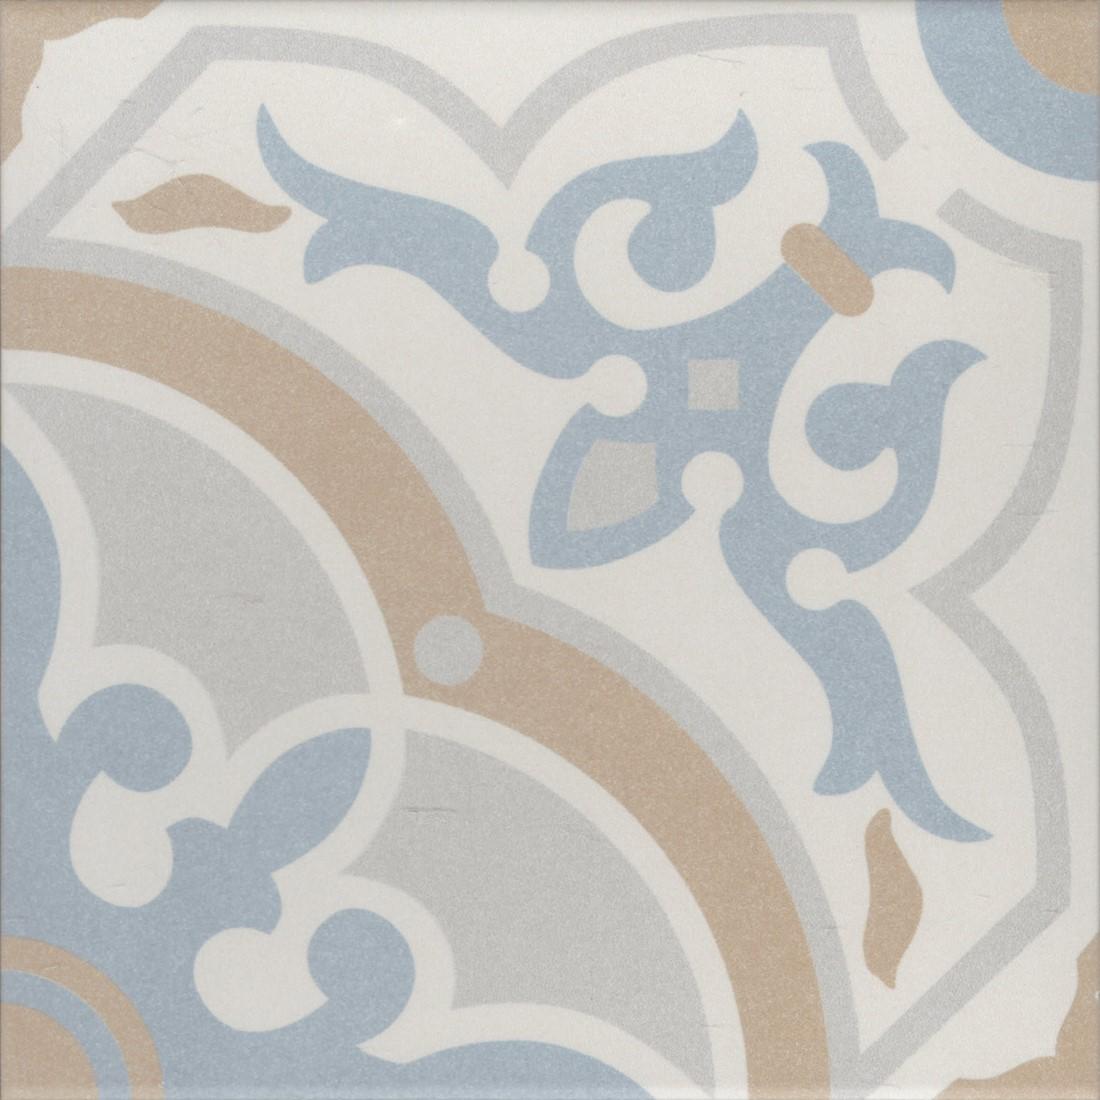 Greatine Bleu tegel